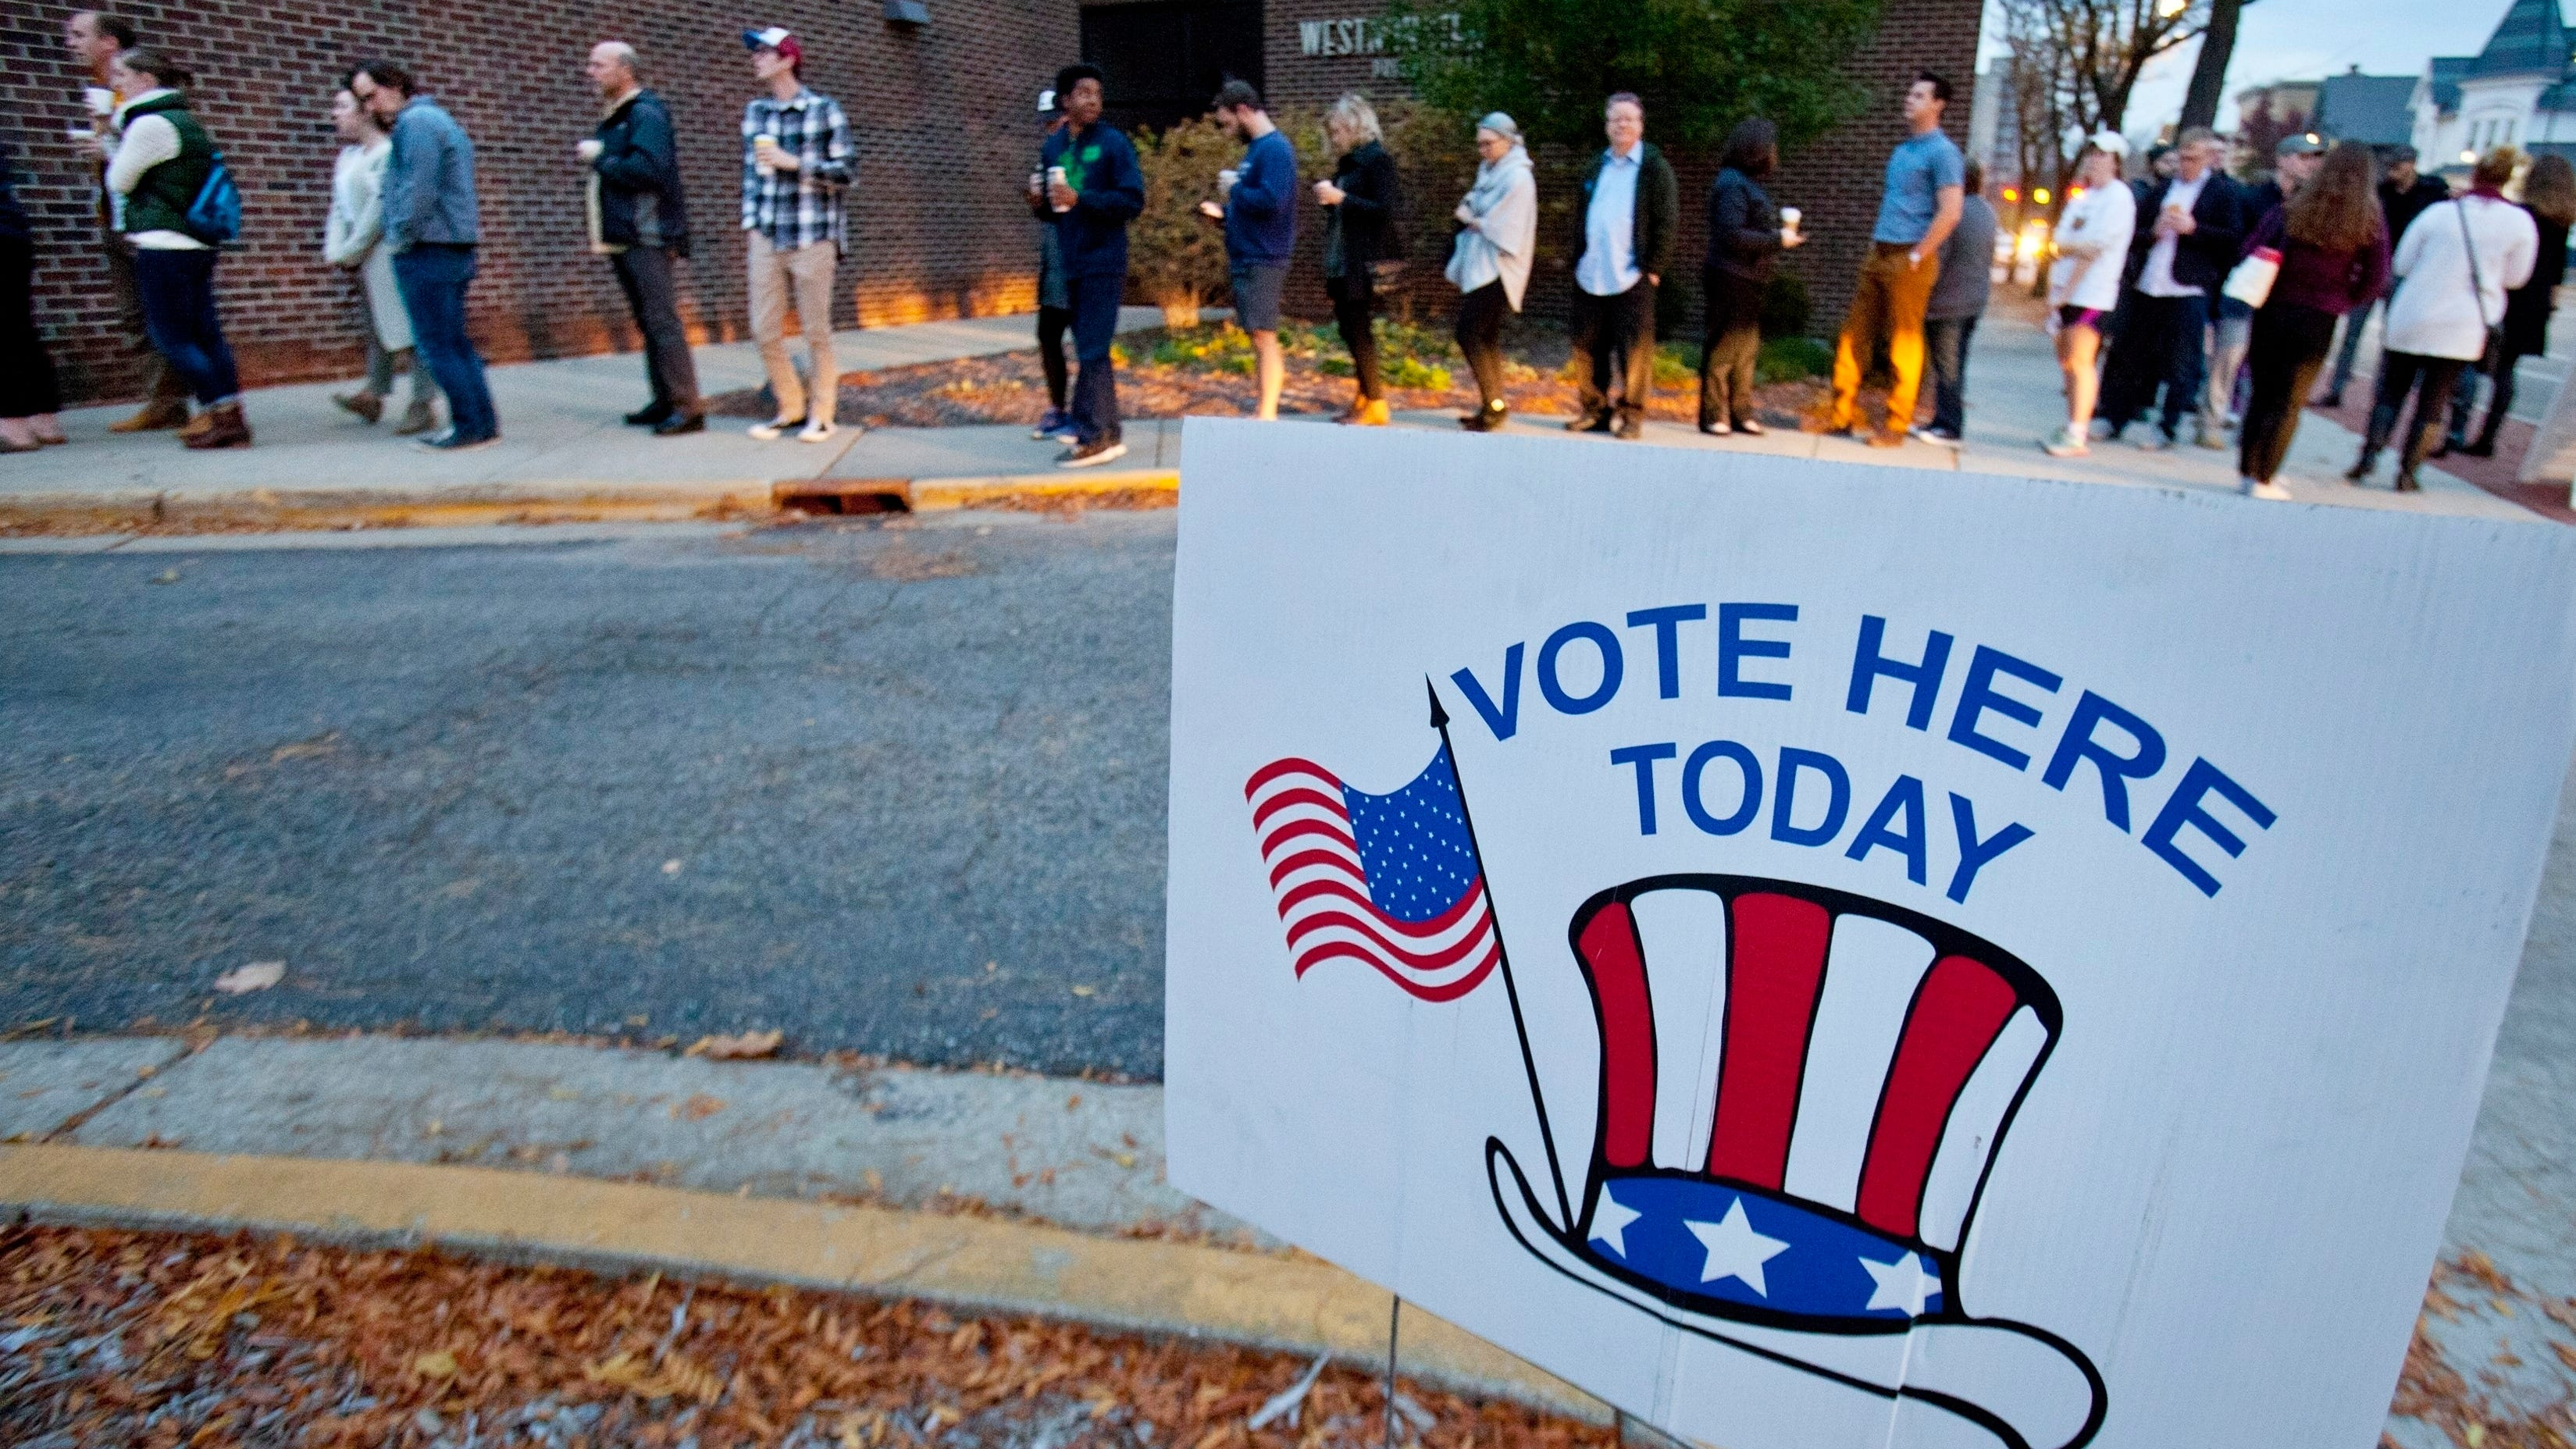 New record: 29 million Hispanics eligible to vote in November